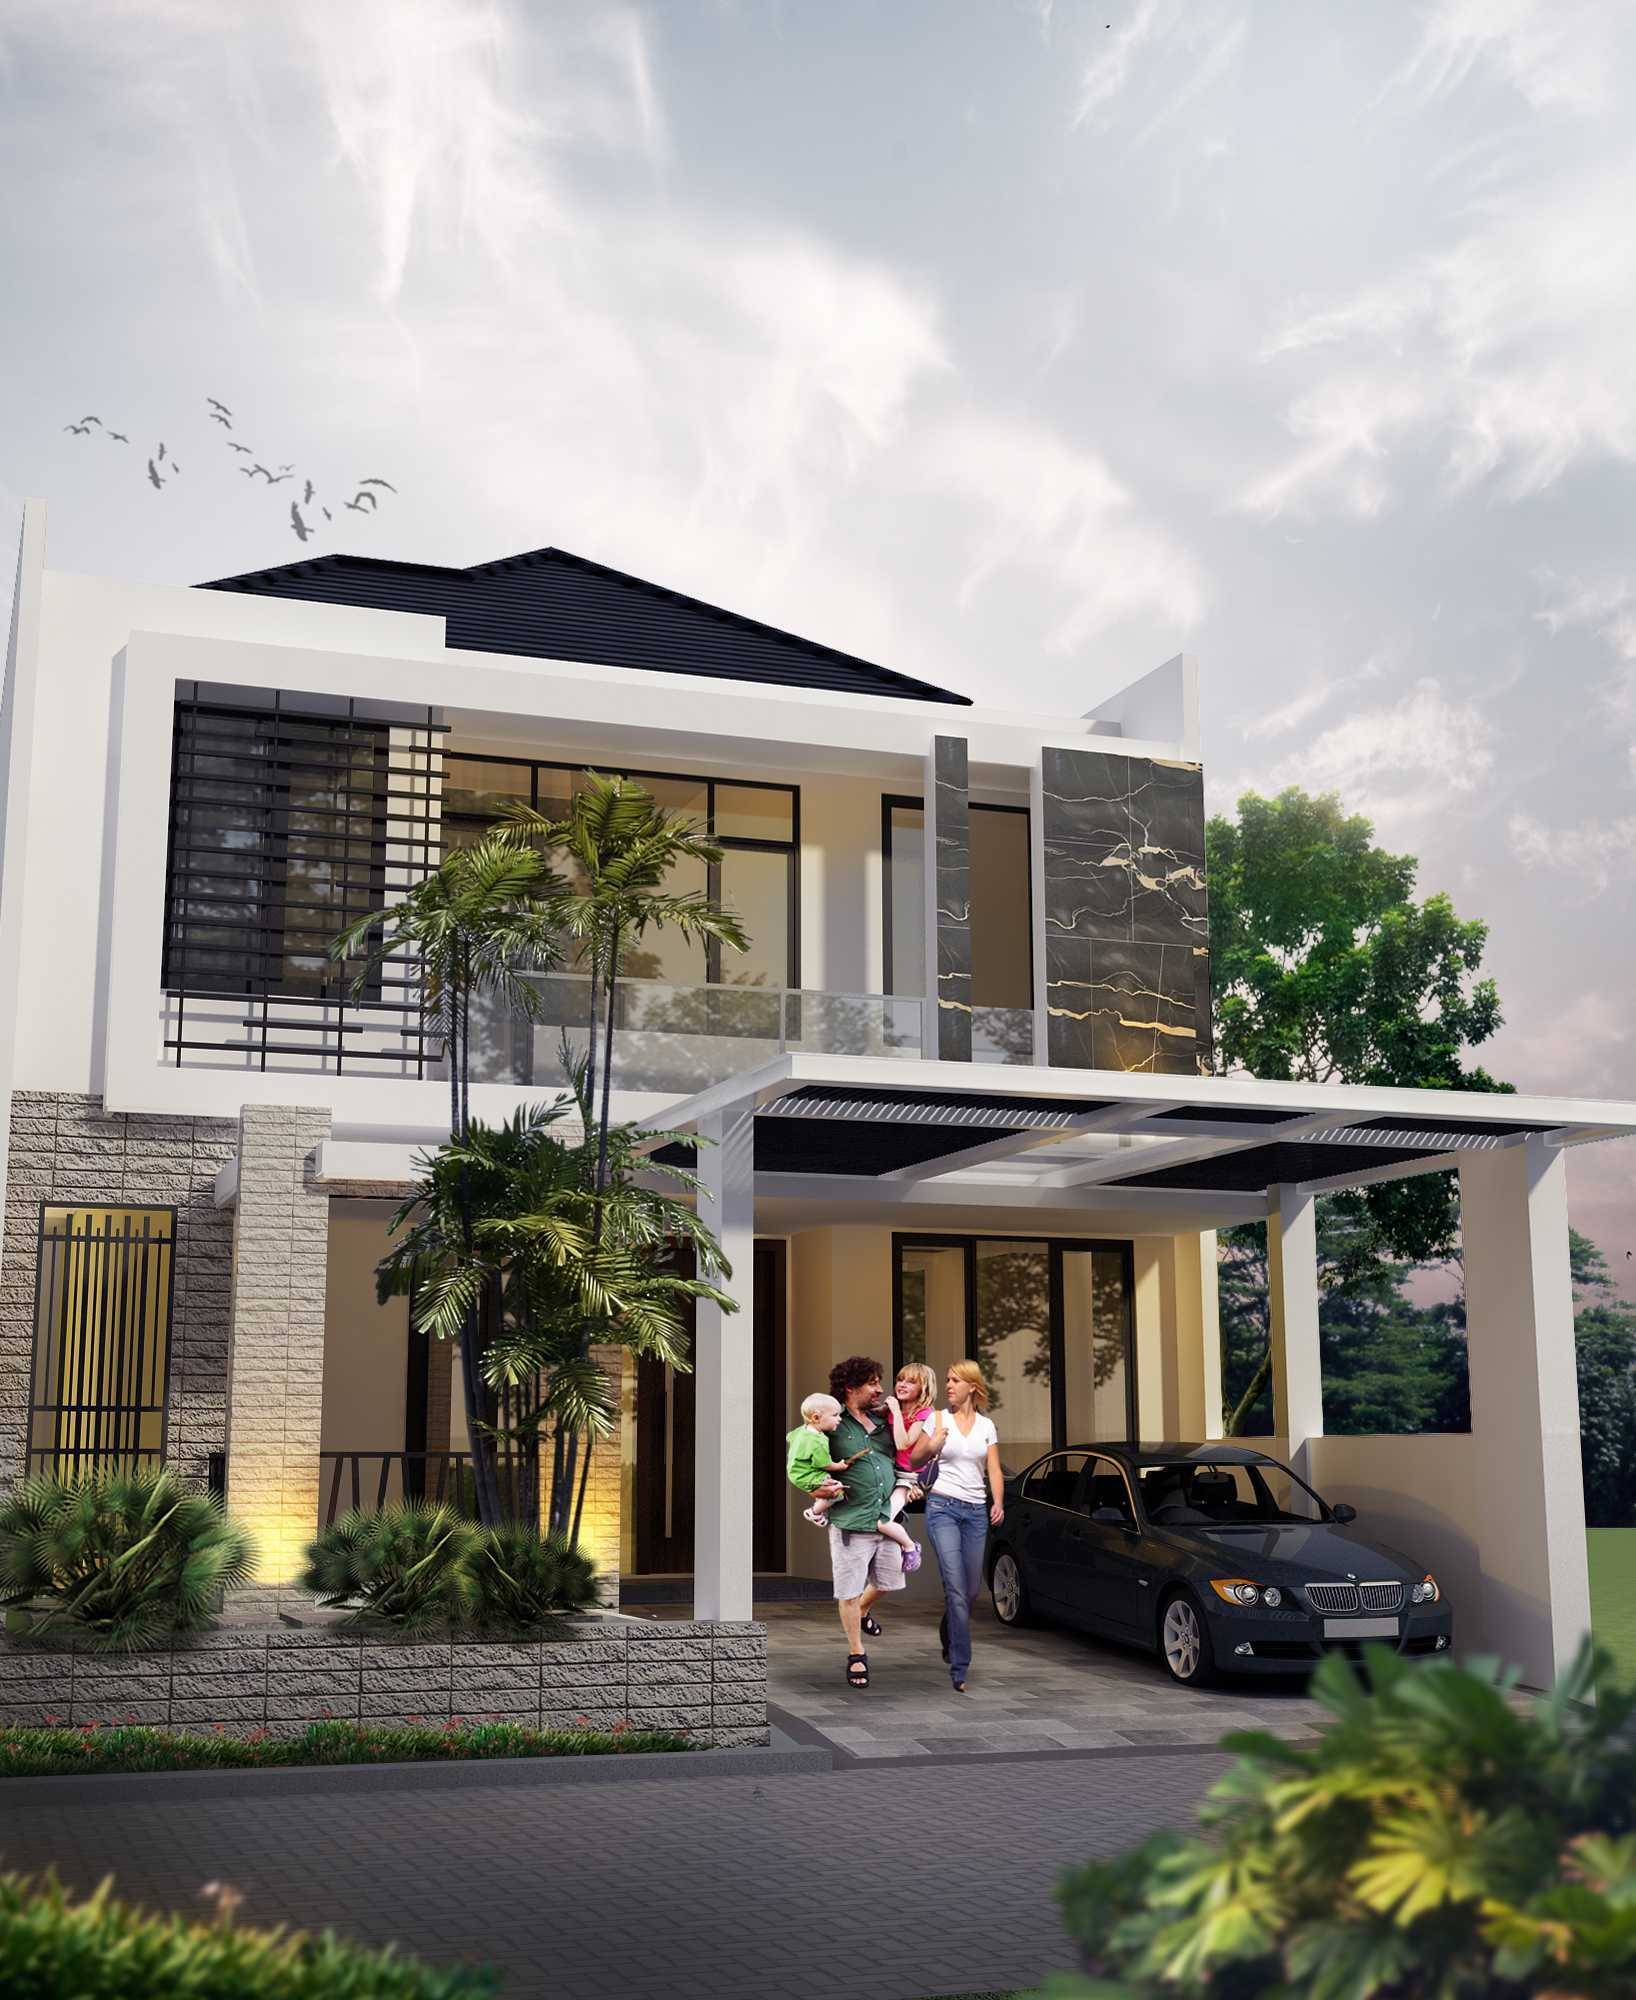 Winner Architecture T Tropical House Jemur Wonosari, Wonocolo, Kota Sby, Jawa Timur 60235, Indonesia Jemur Wonosari, Wonocolo, Kota Sby, Jawa Timur 60235, Indonesia T Tropical House - Exterior Tropical  40963